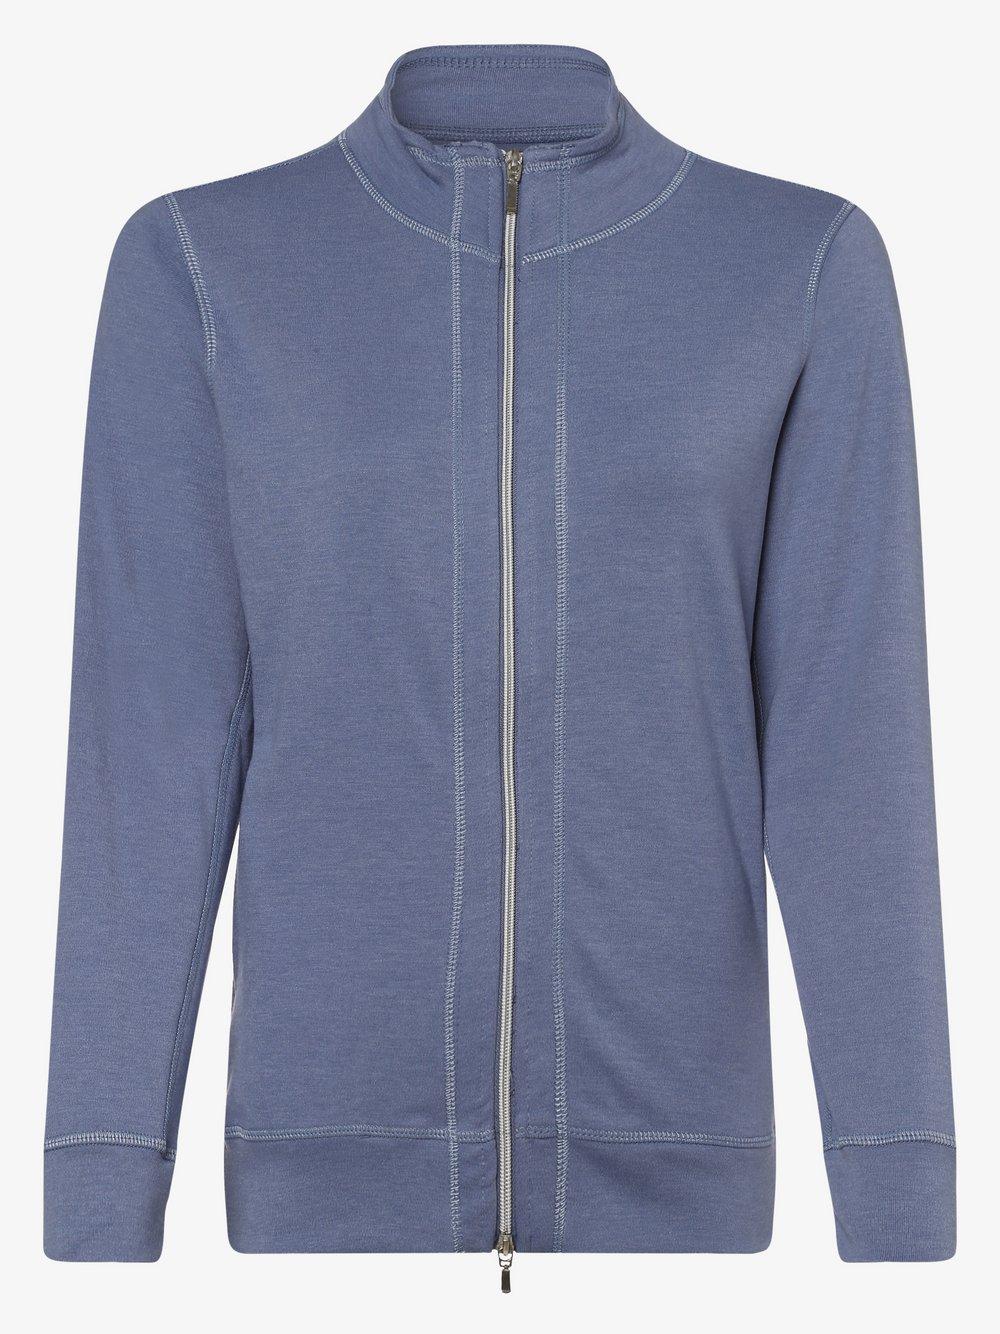 Franco Callegari - Damska bluza rozpinana, niebieski